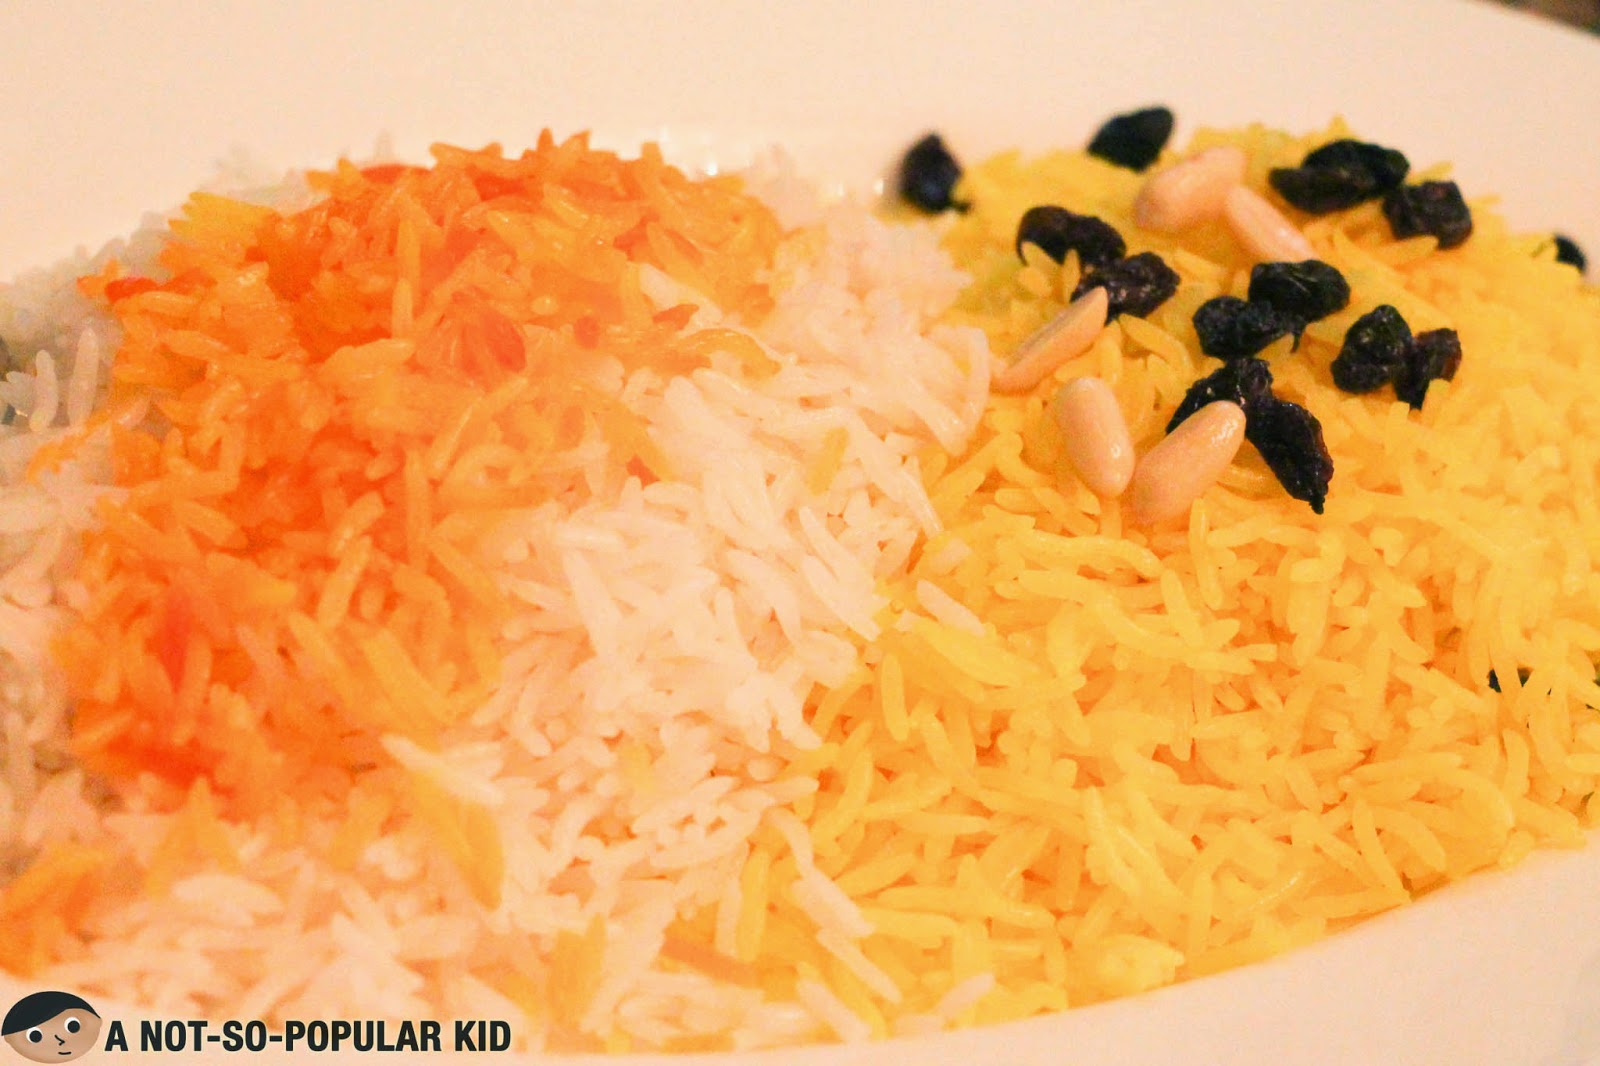 The rice platter that goes along with the Arya Sini Kamel platter